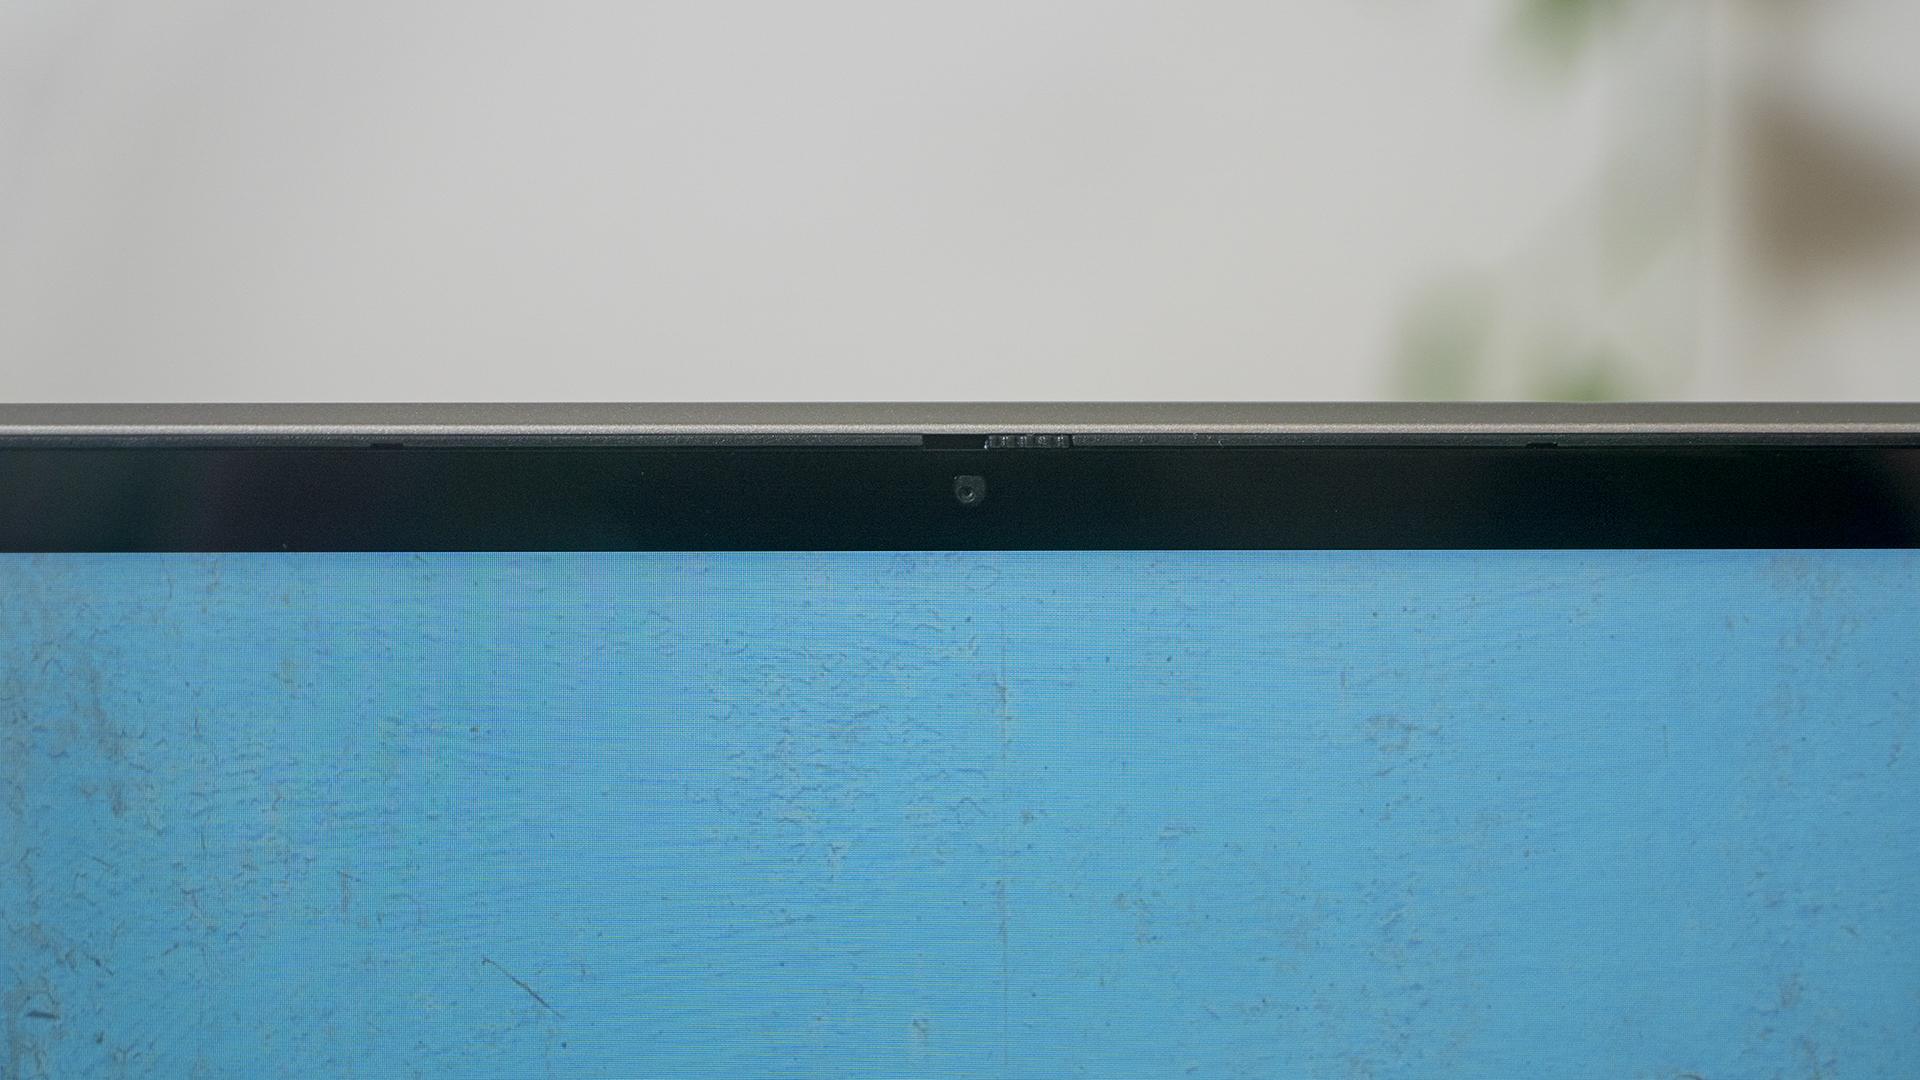 Lenovo IdeaPad Flex 5 Webcam Display Close Up